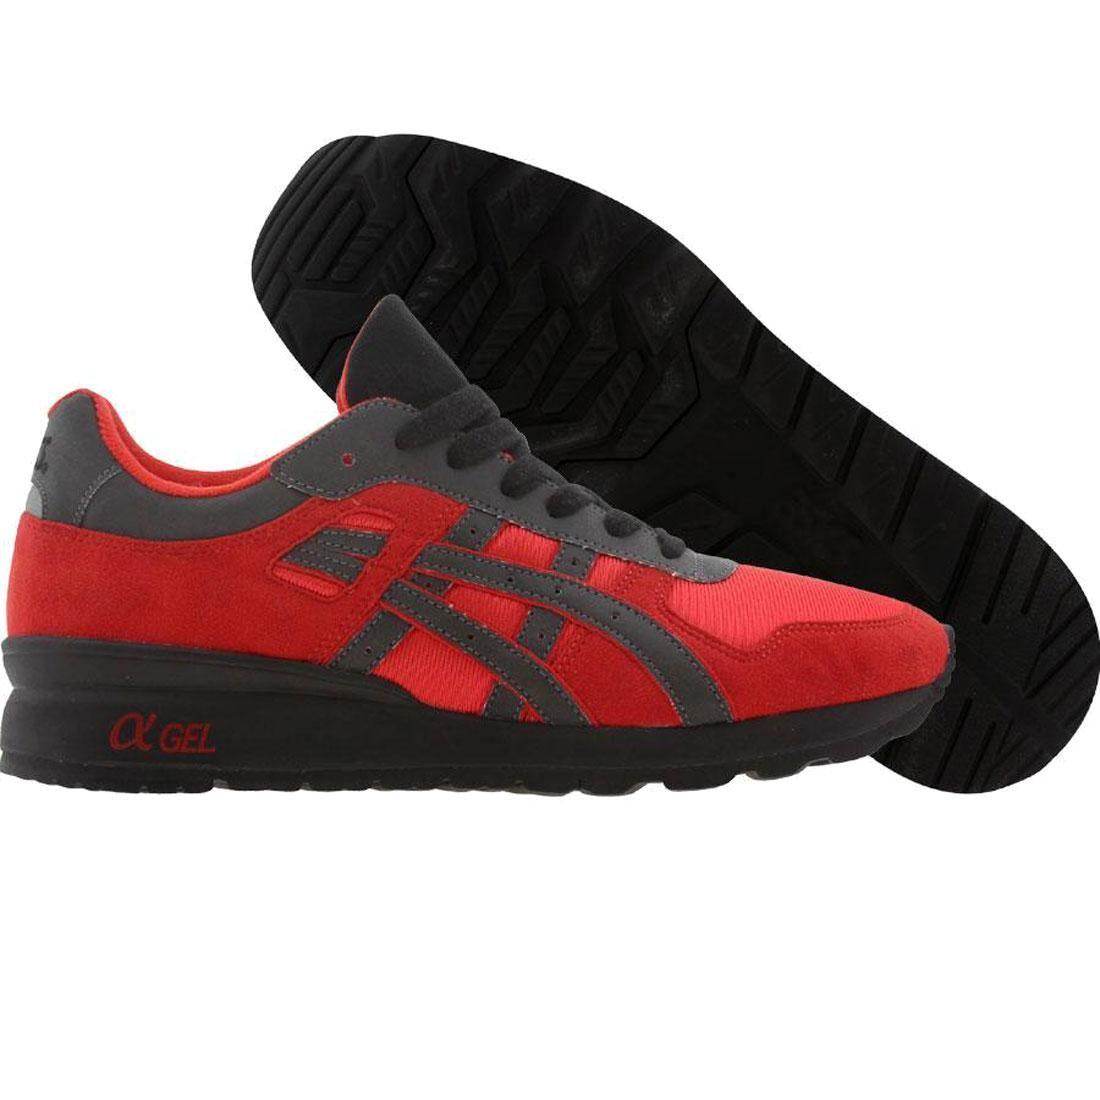 przybywa buty sportowe kupować nowe BAIT x Asics Tiger GT-II Premium 3M Rings Pack - Red Ring (red / black)